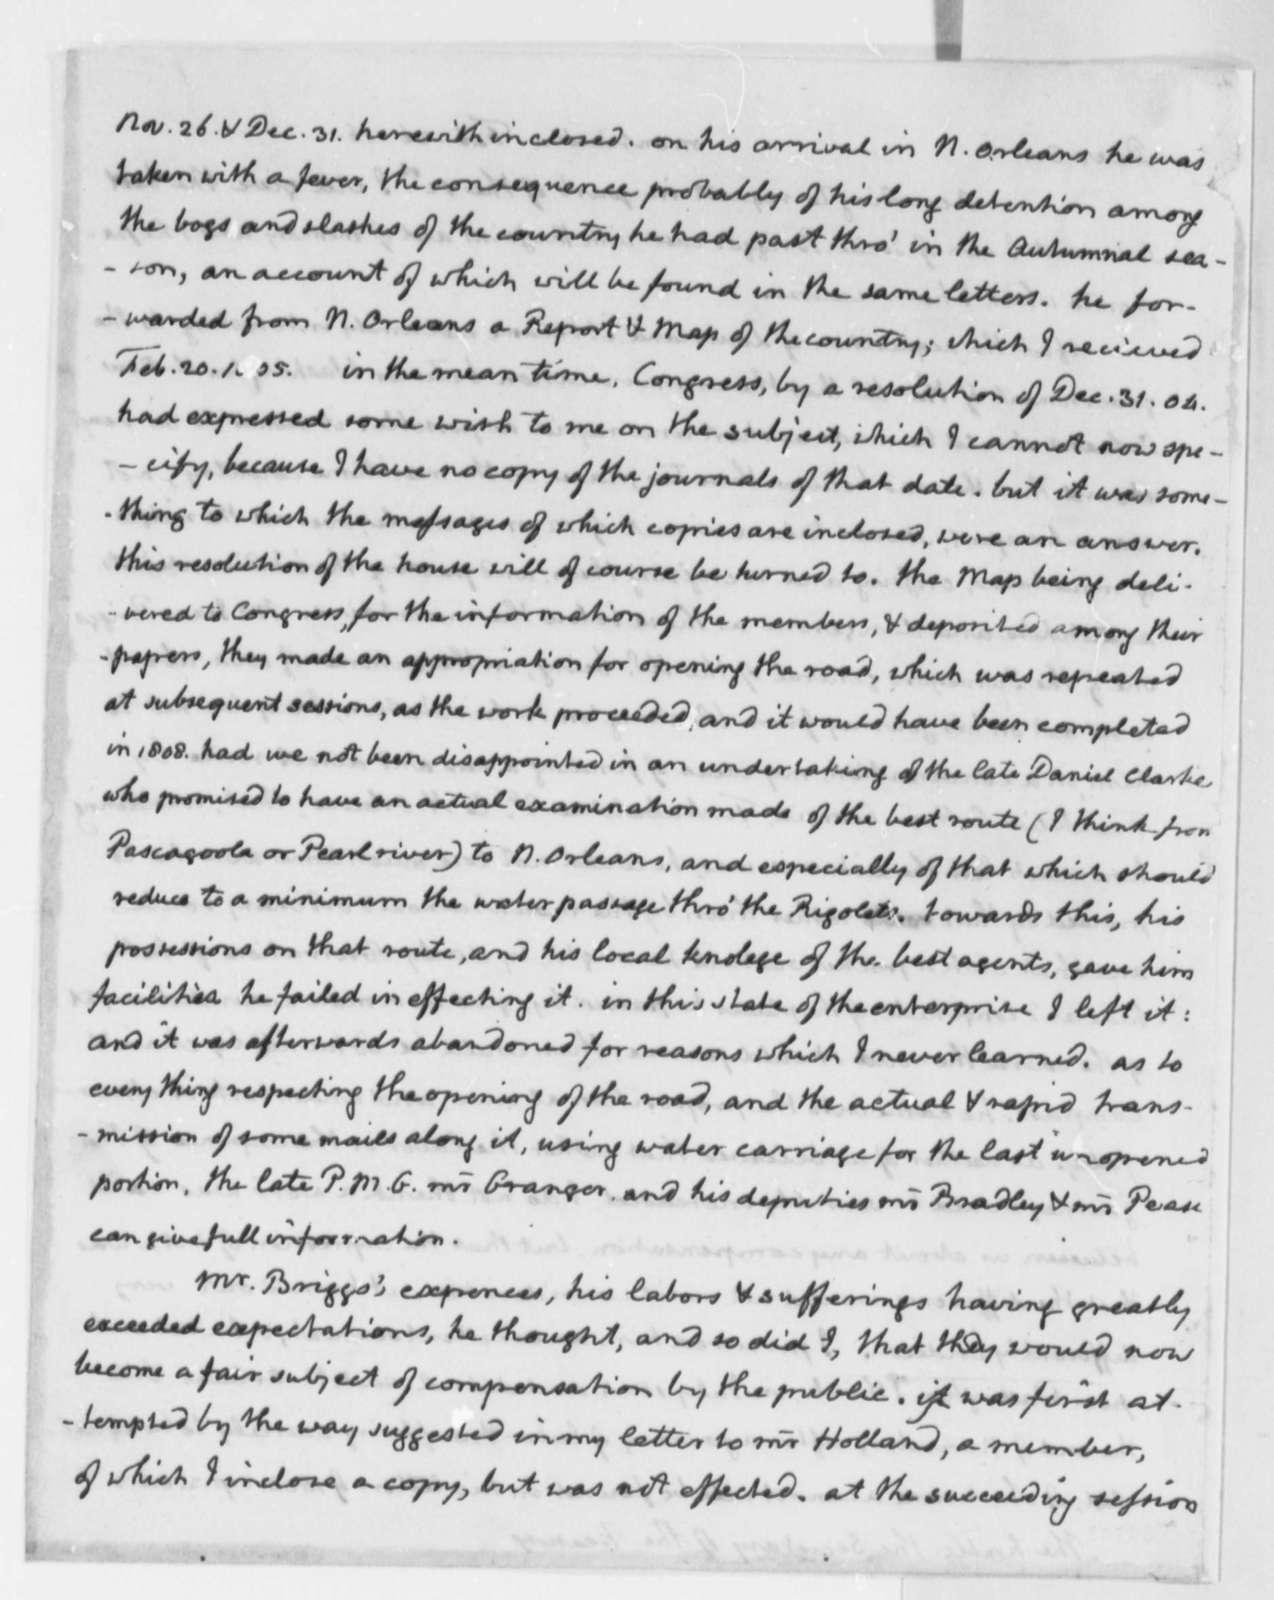 Thomas Jefferson to Alexander J. Dallas, February 26, 1816